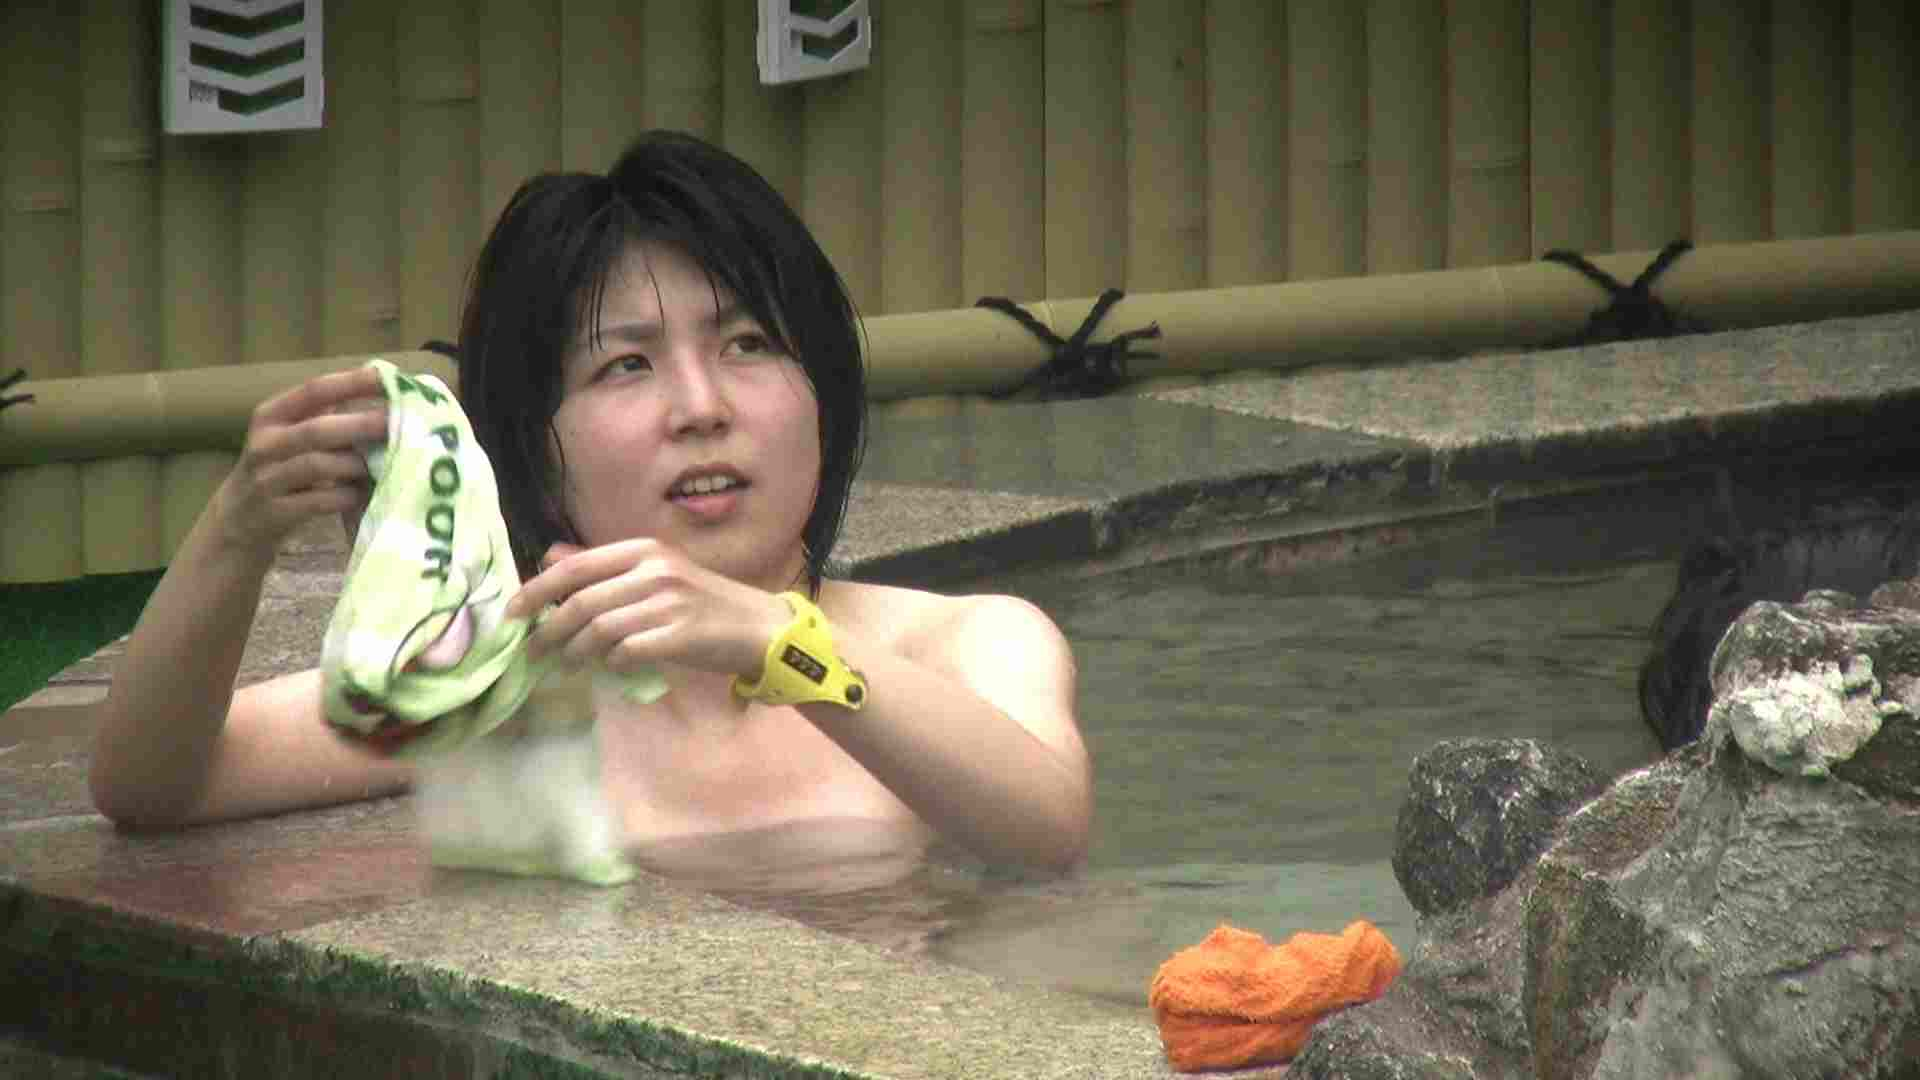 Aquaな露天風呂Vol.188 露天風呂編  88PIX 50